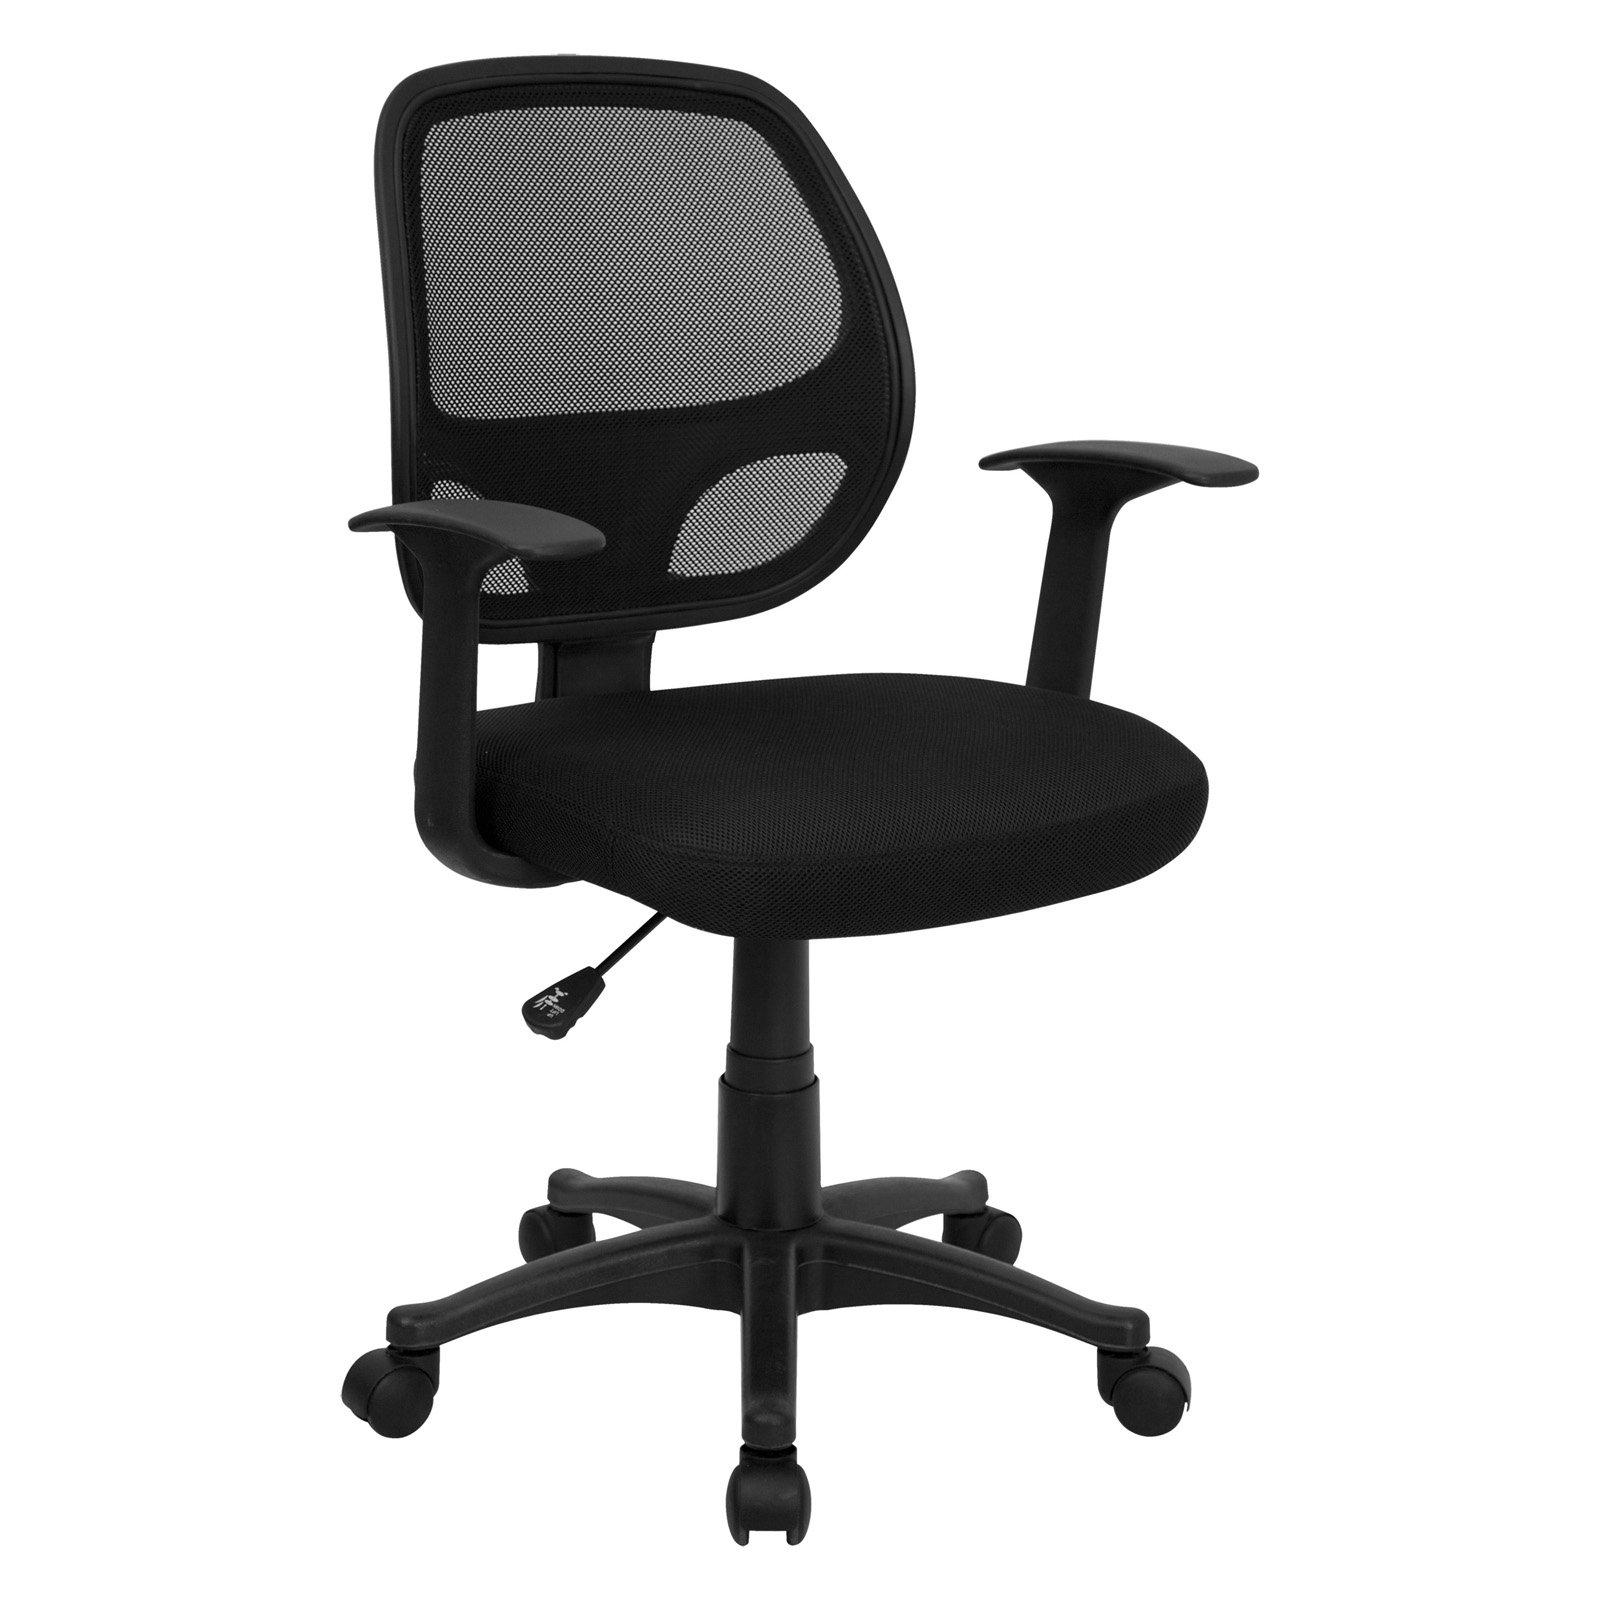 Flash Furniture computer chair with mesh back, black HIUACZK